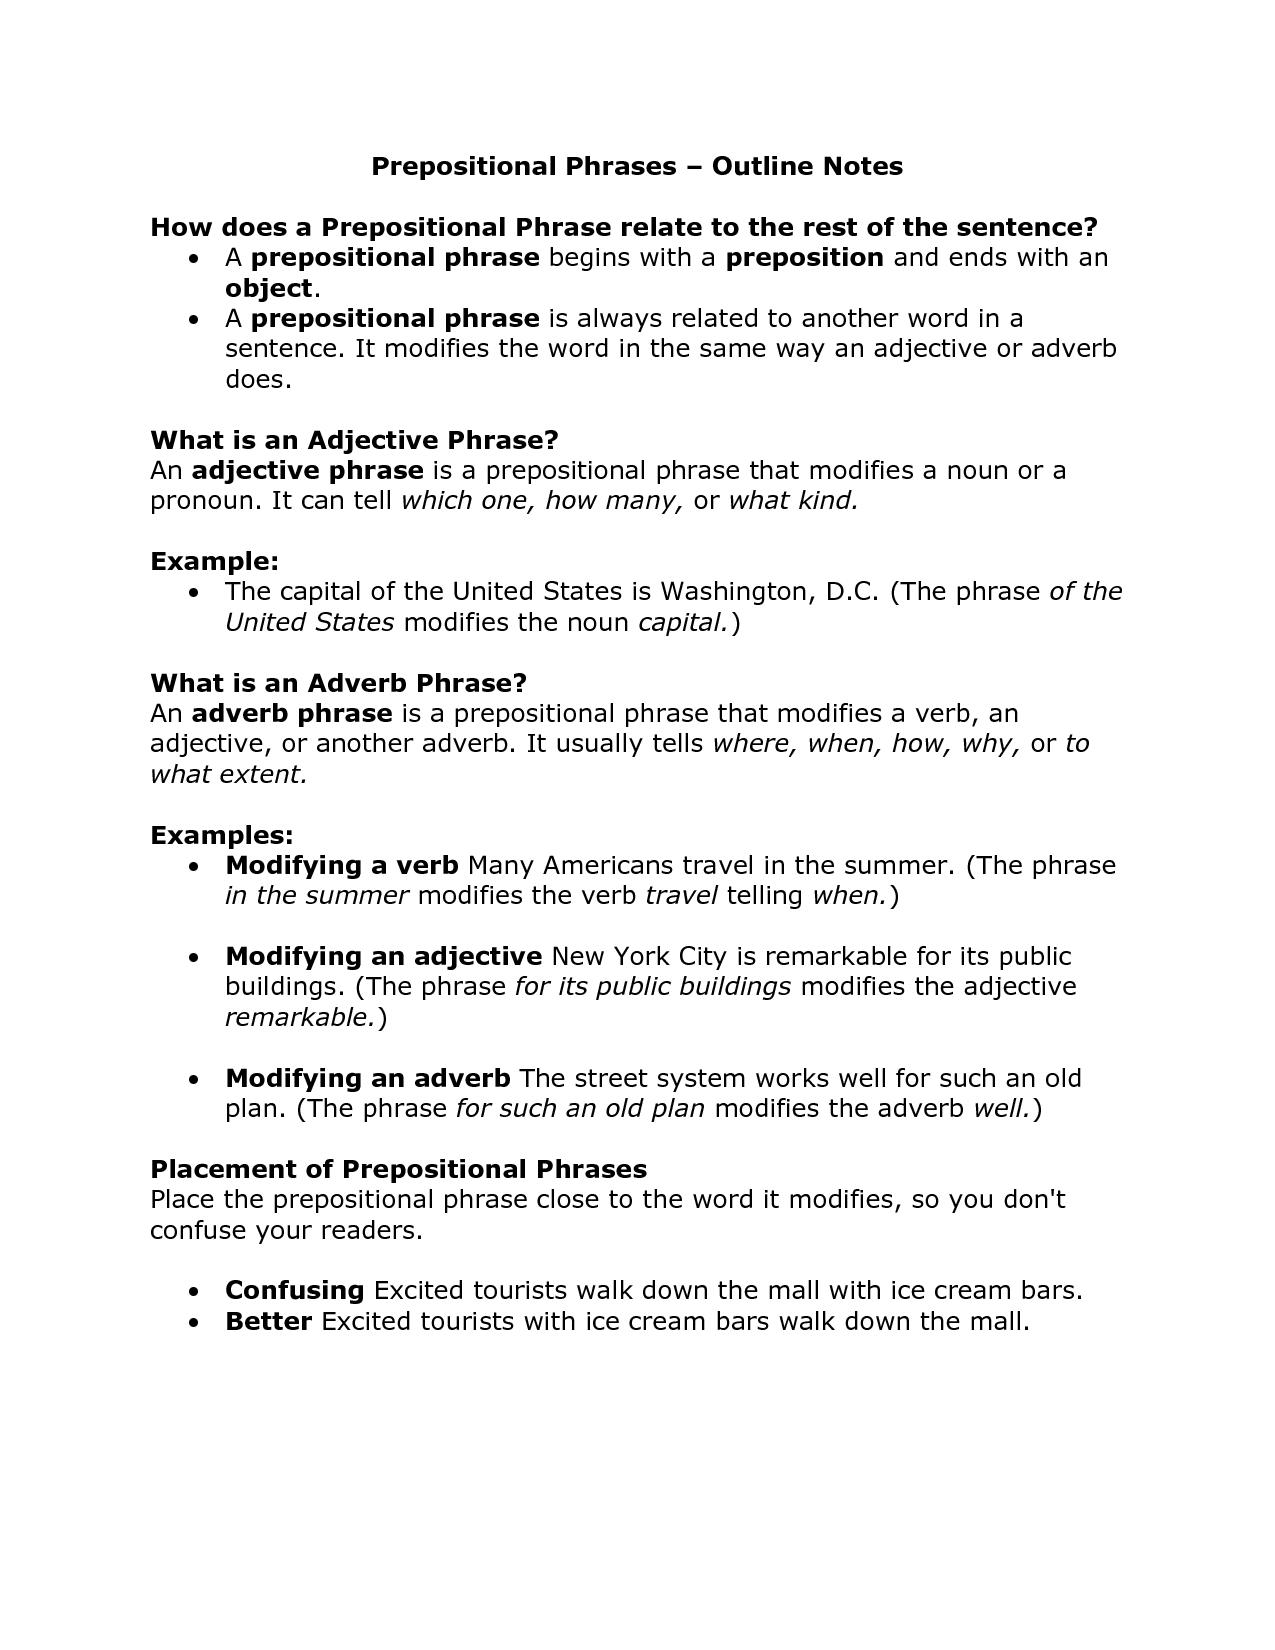 Uncategorized Predicate Nominative Worksheet adjective prepositional phrase phrases worksheets outline notes